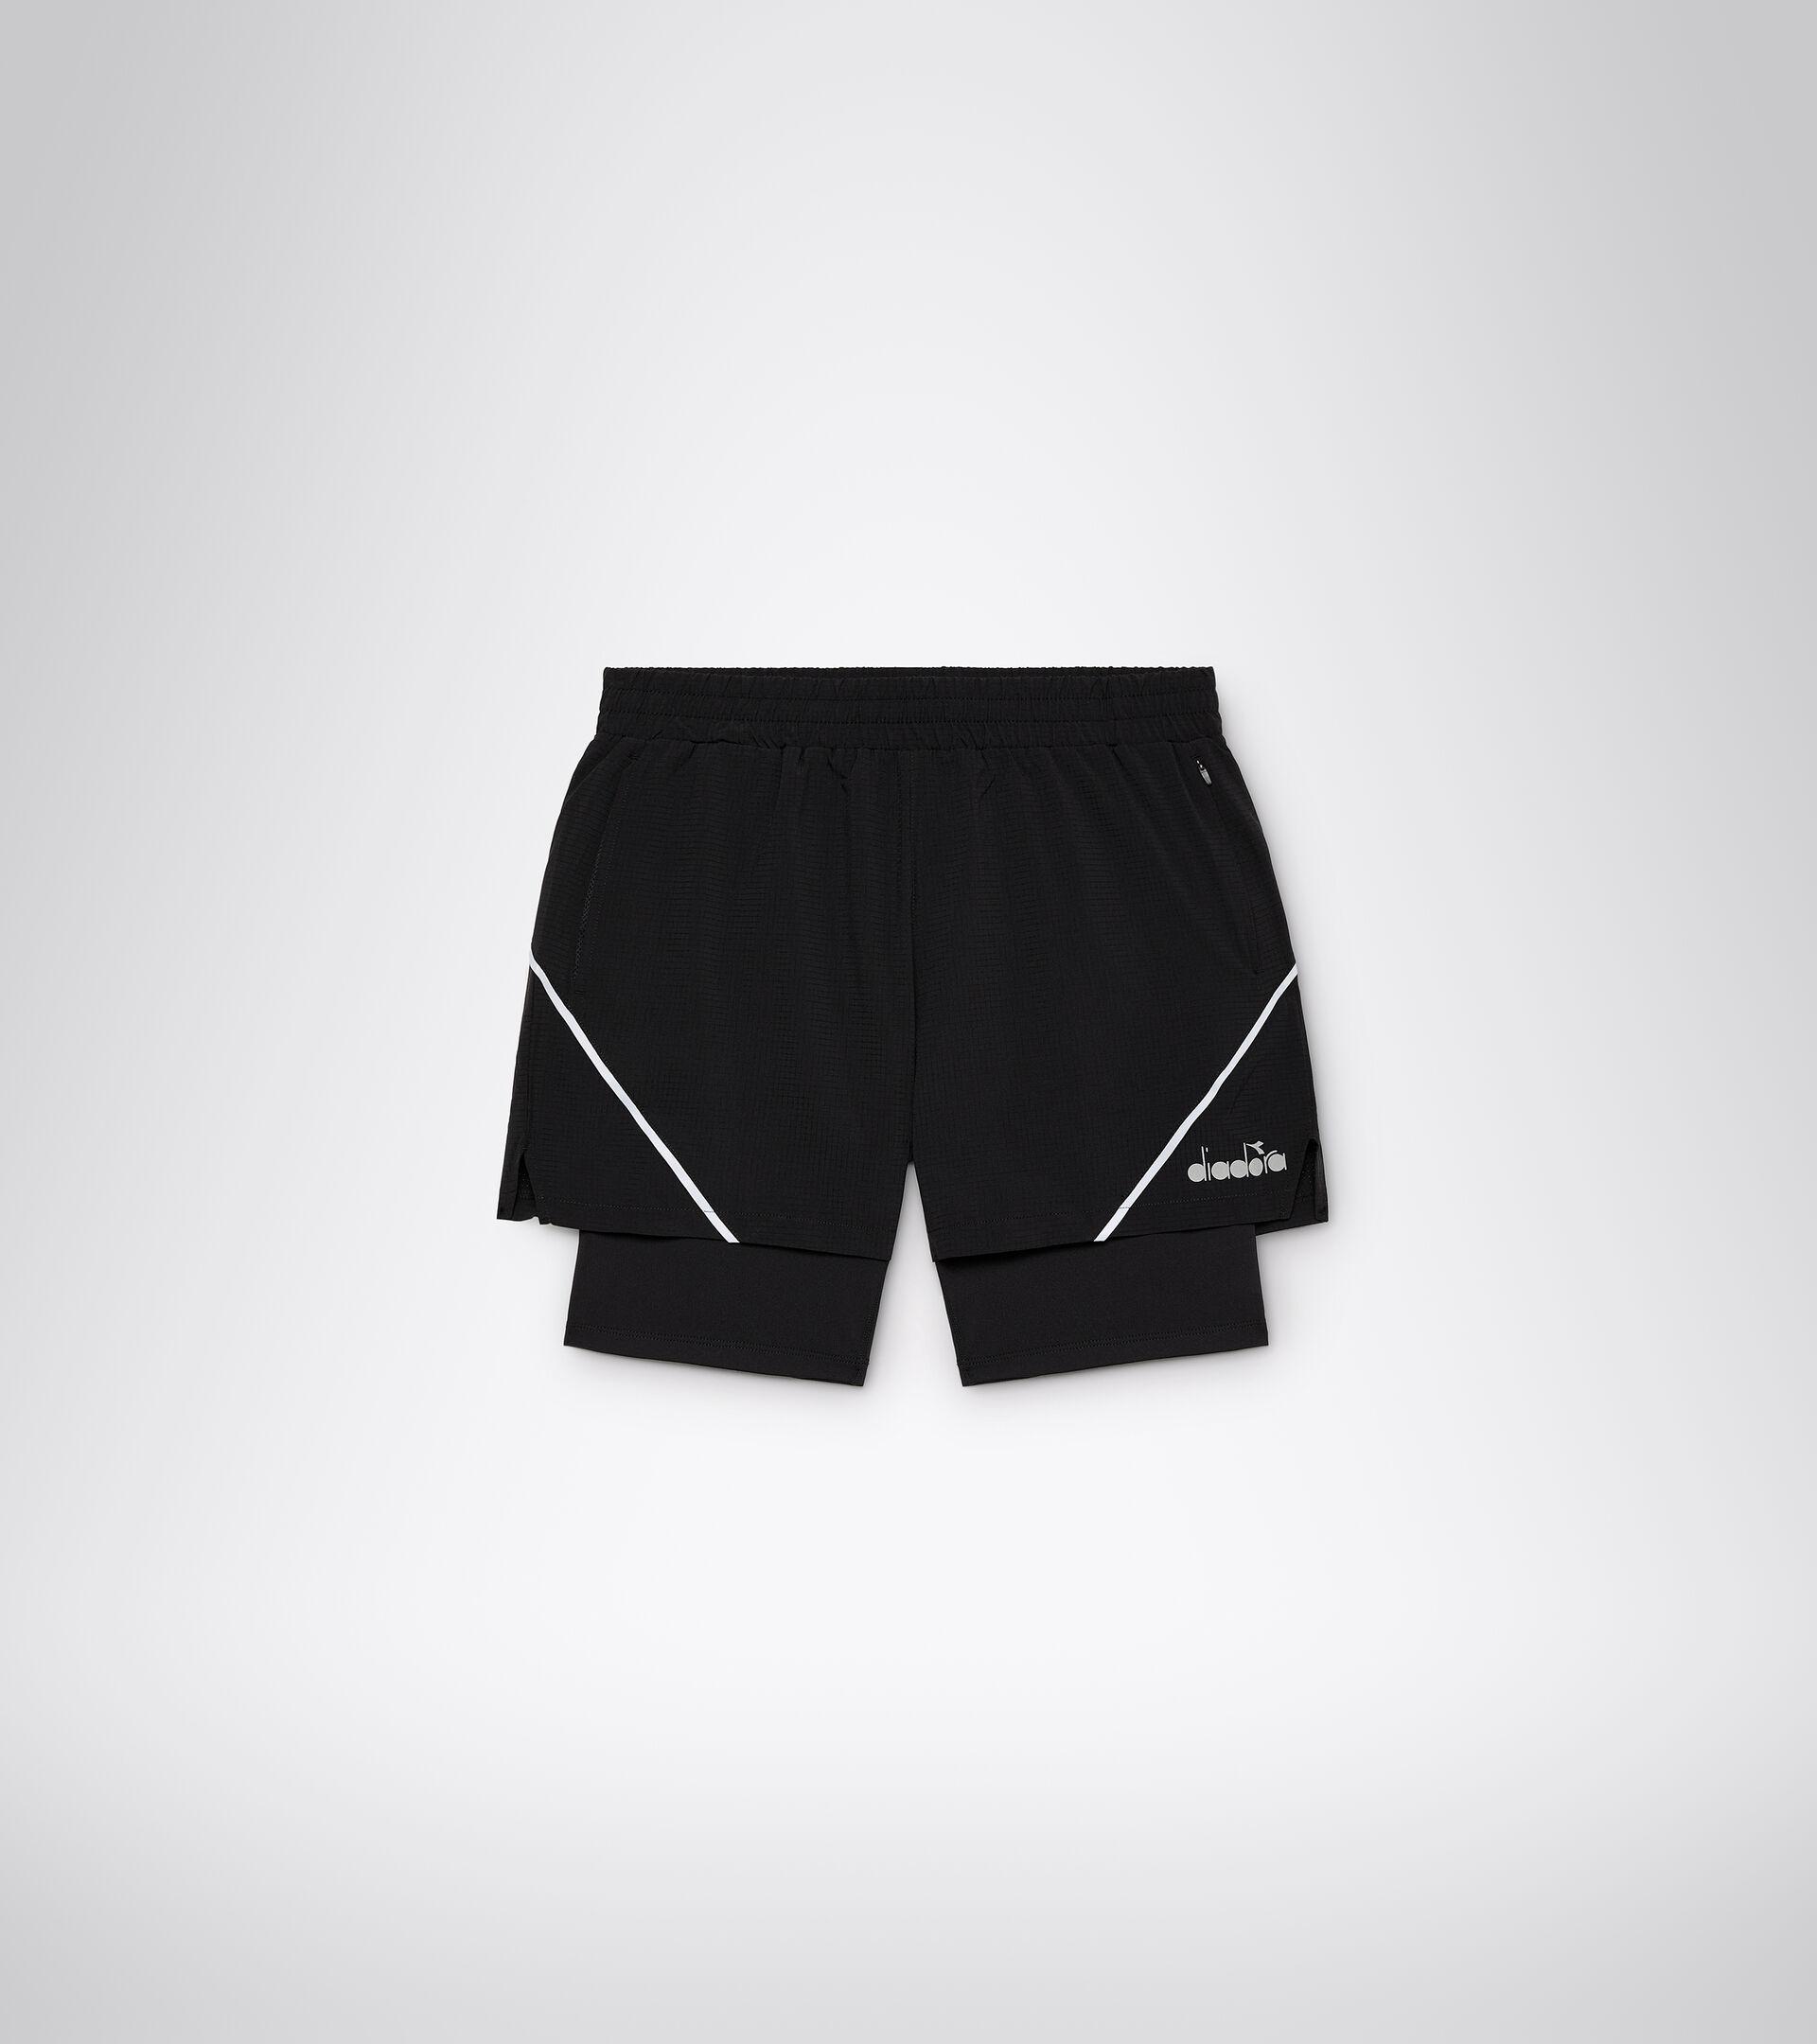 Running shorts - Men DOUBLE LAYER BERMUDA BLACK - Diadora